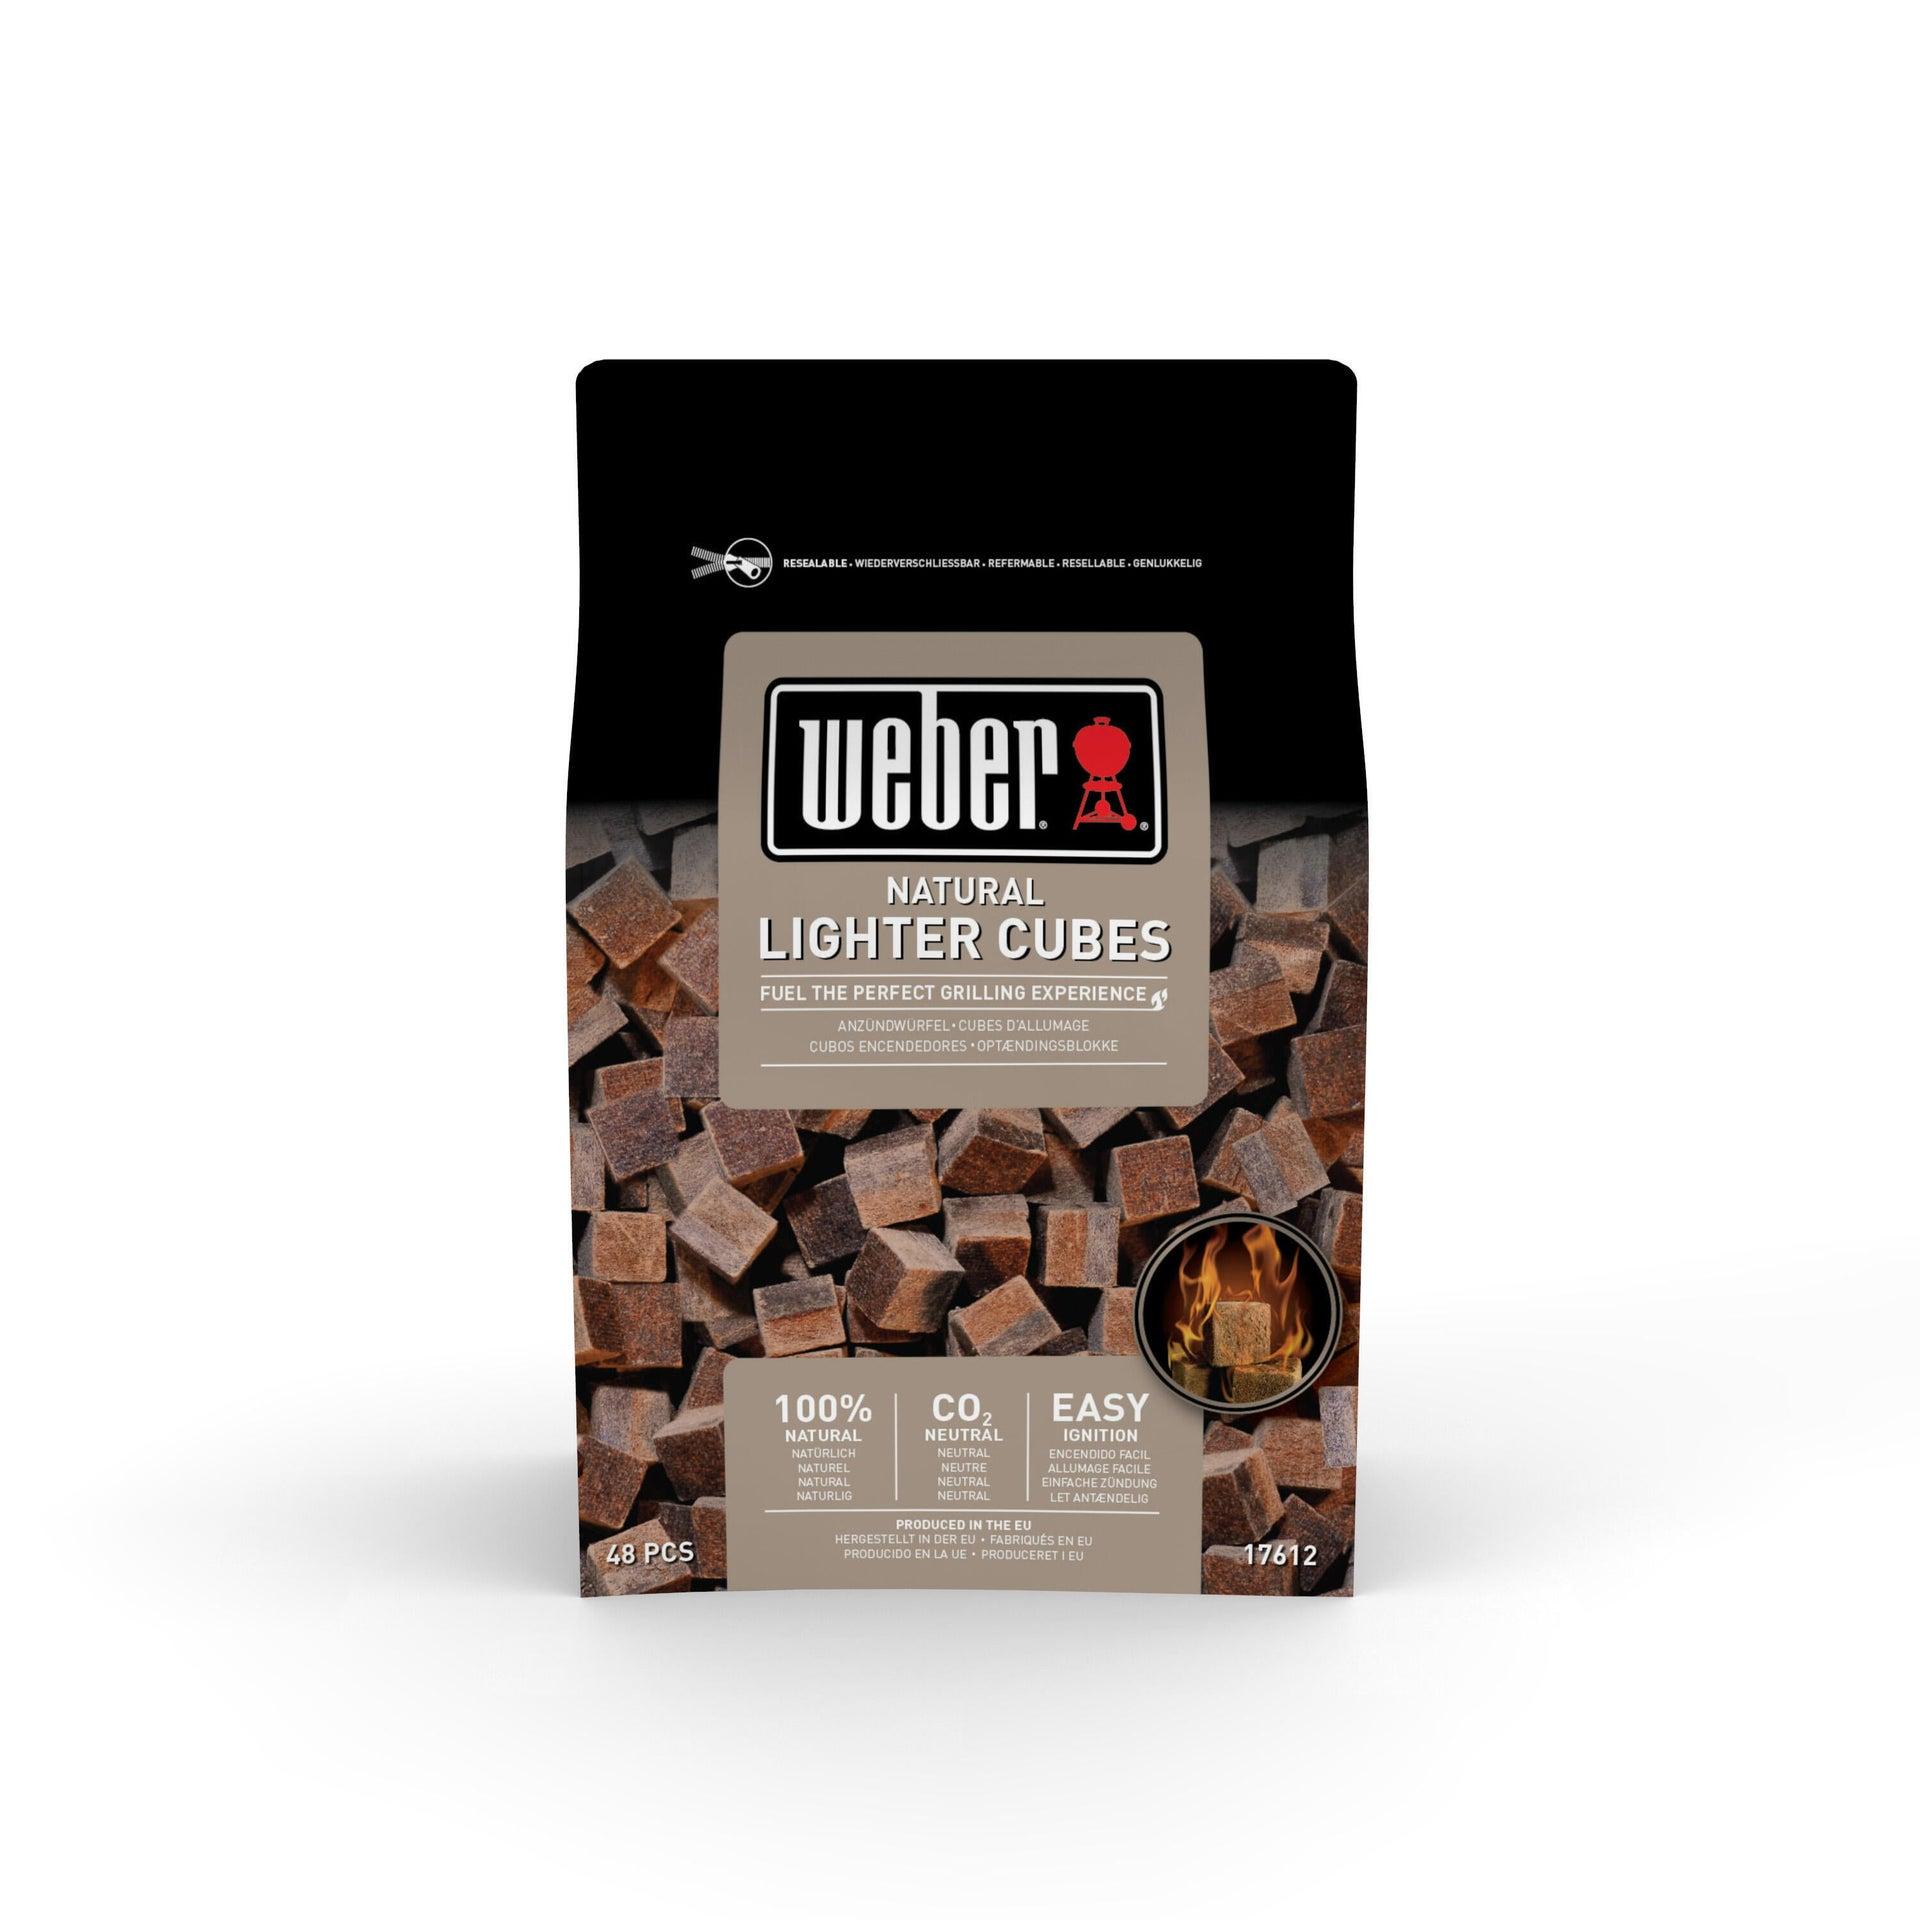 Cubetti di accensione WEBER 48 pezzi - 2